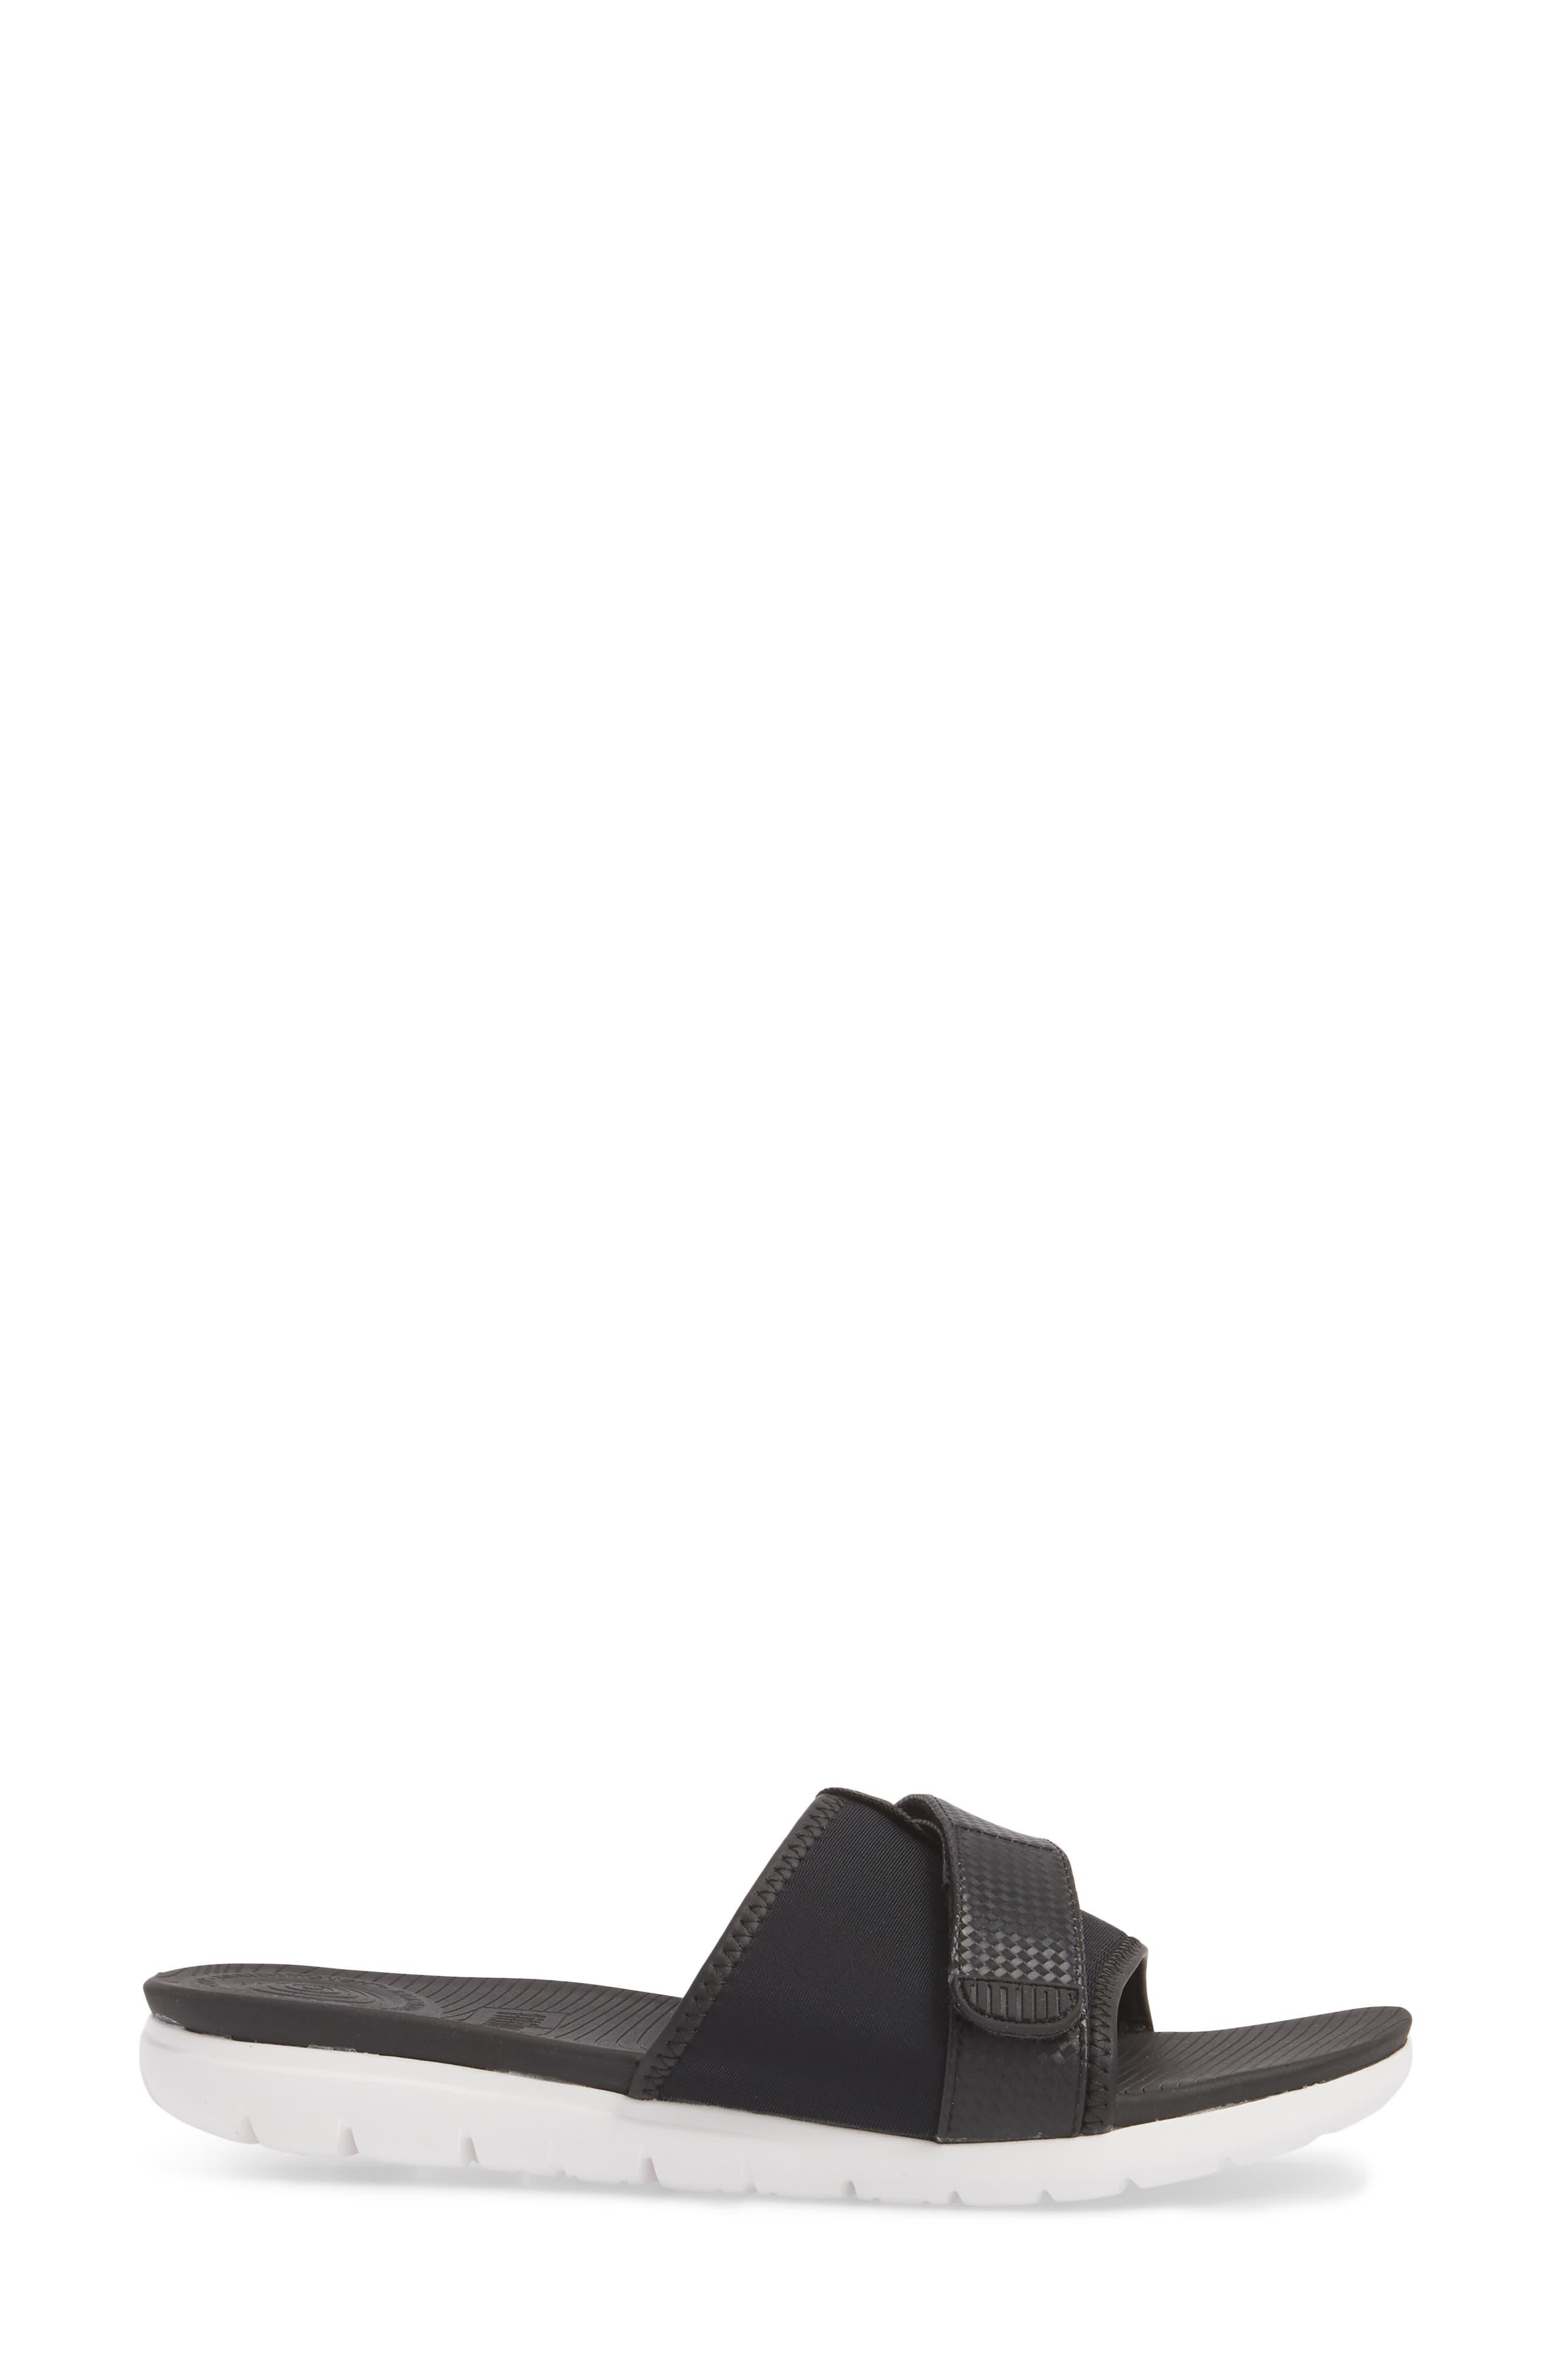 Neoflex Slide Sandal,                             Alternate thumbnail 3, color,                             BLACK FABRIC